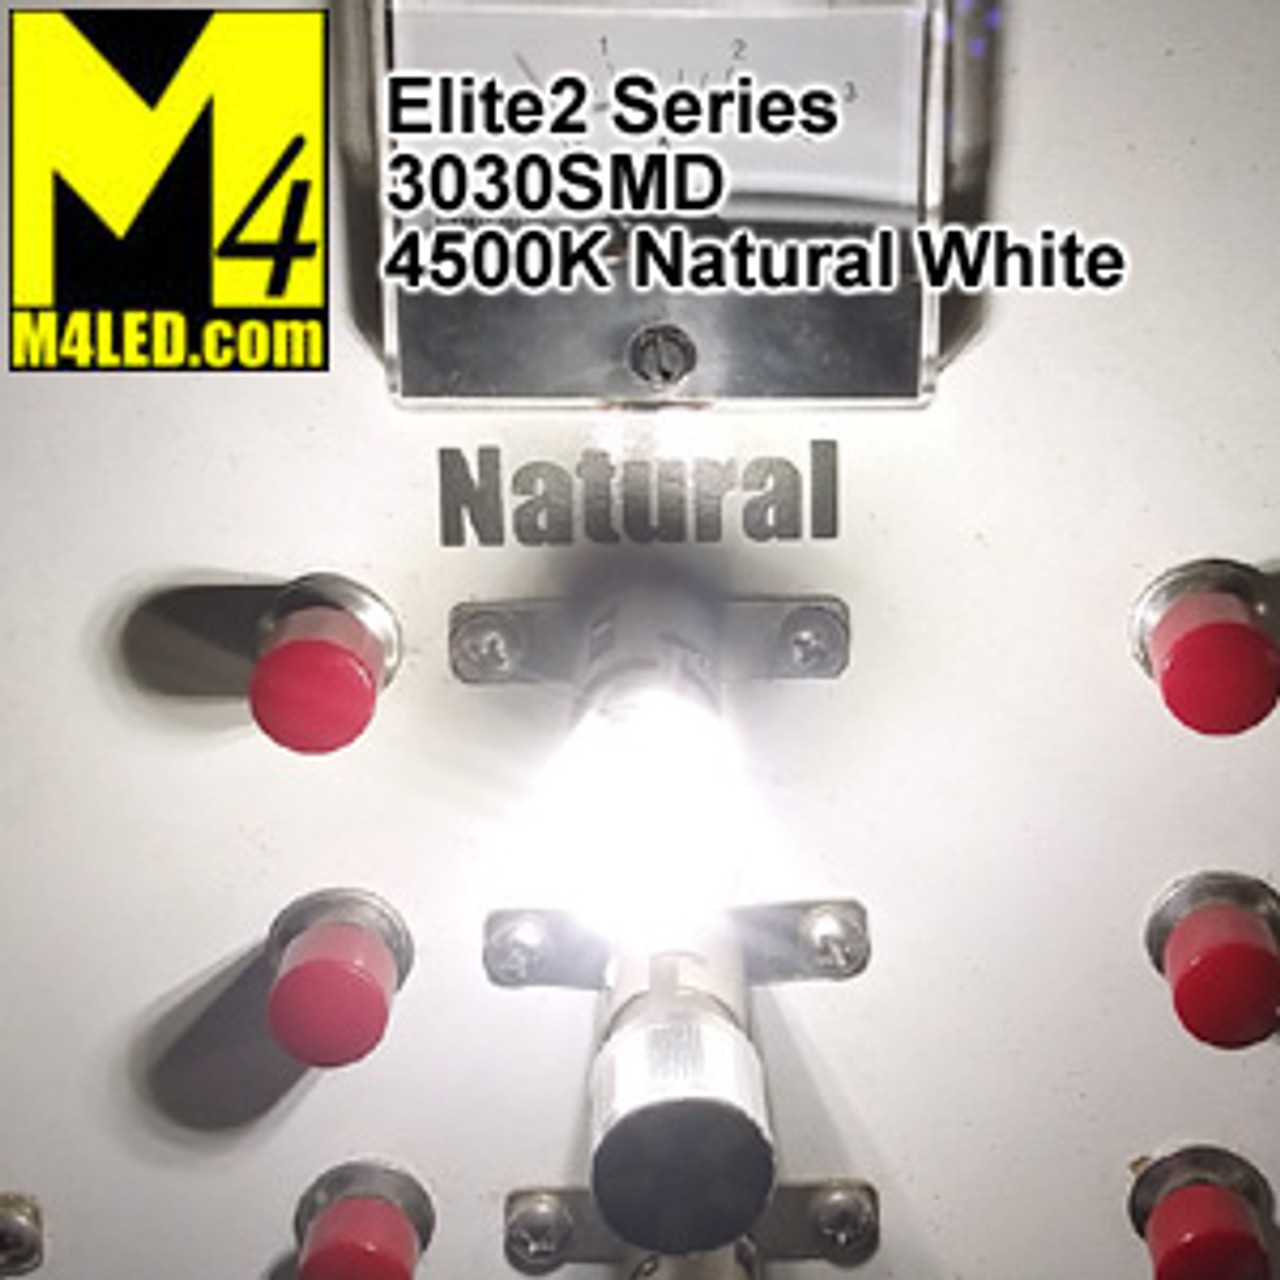 1156-9-3030-NW Natural White Elite2 (1003/1141/1156) BA15s Base